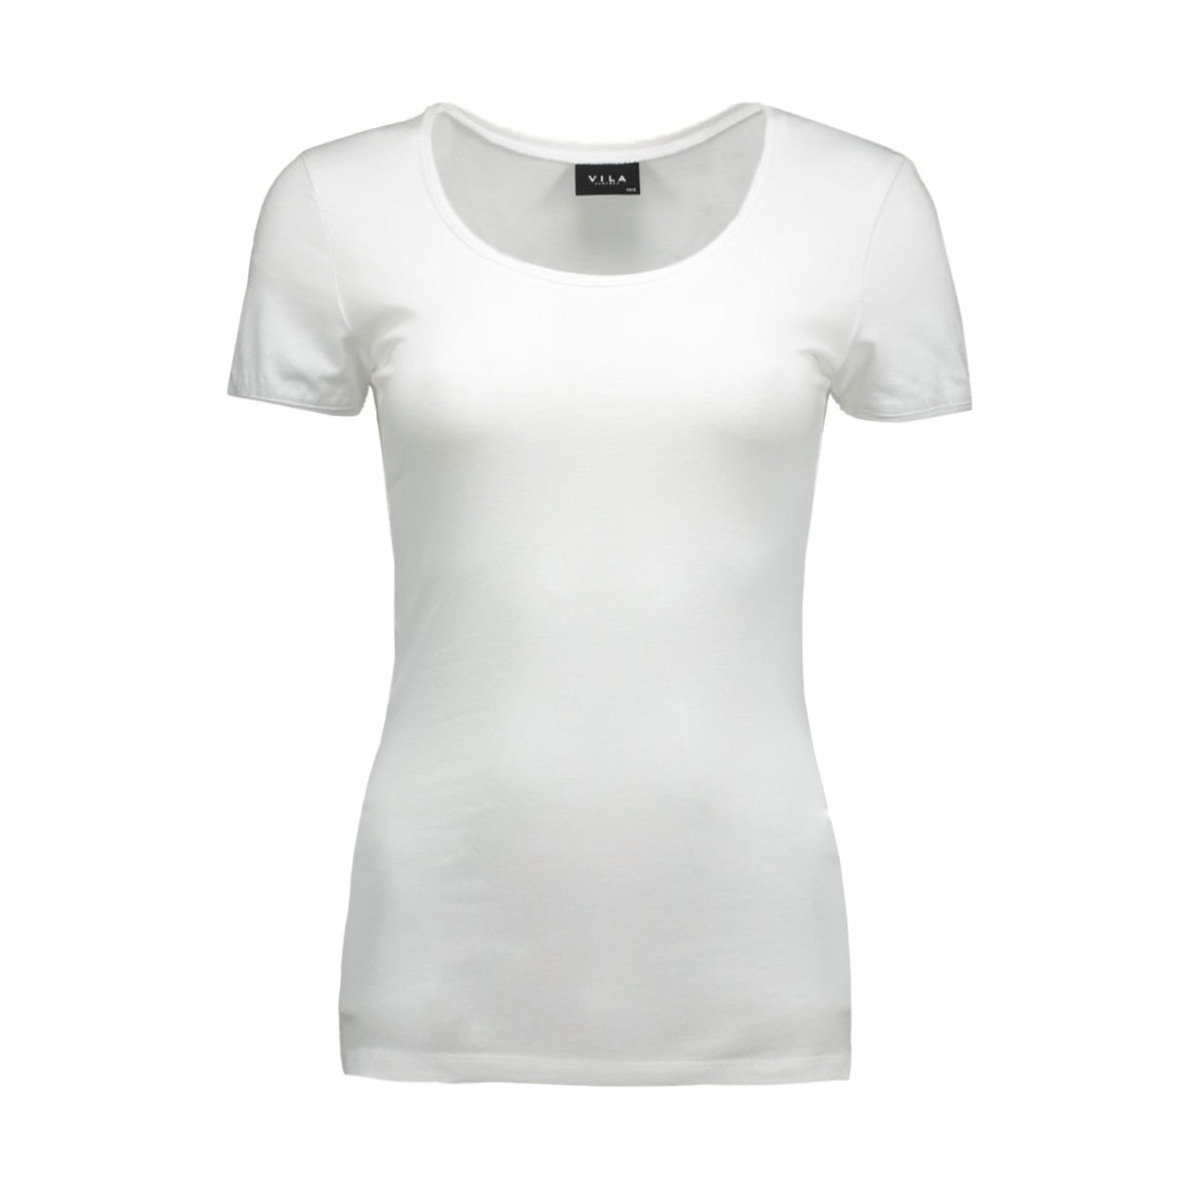 viofficiel new ss top 14032644 vila t-shirt optical snow